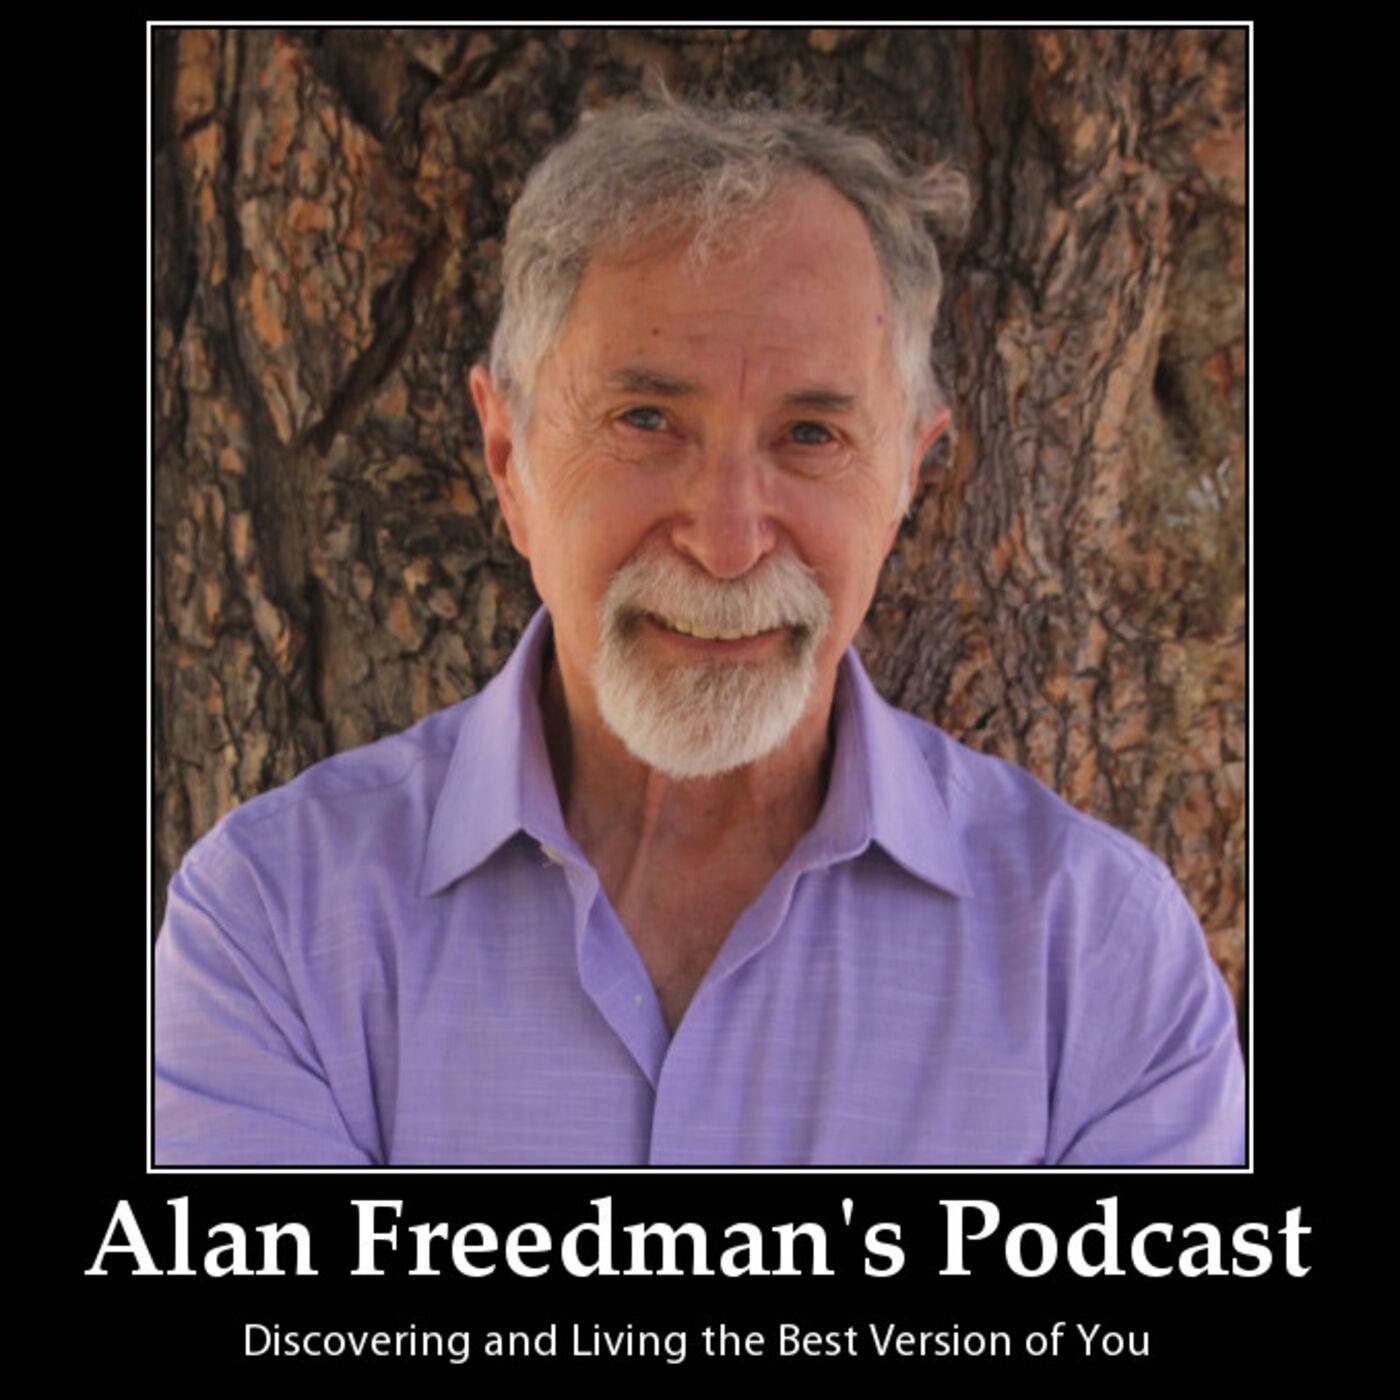 A Walk in Progress - Featuring Podcast Host Alan Freedman